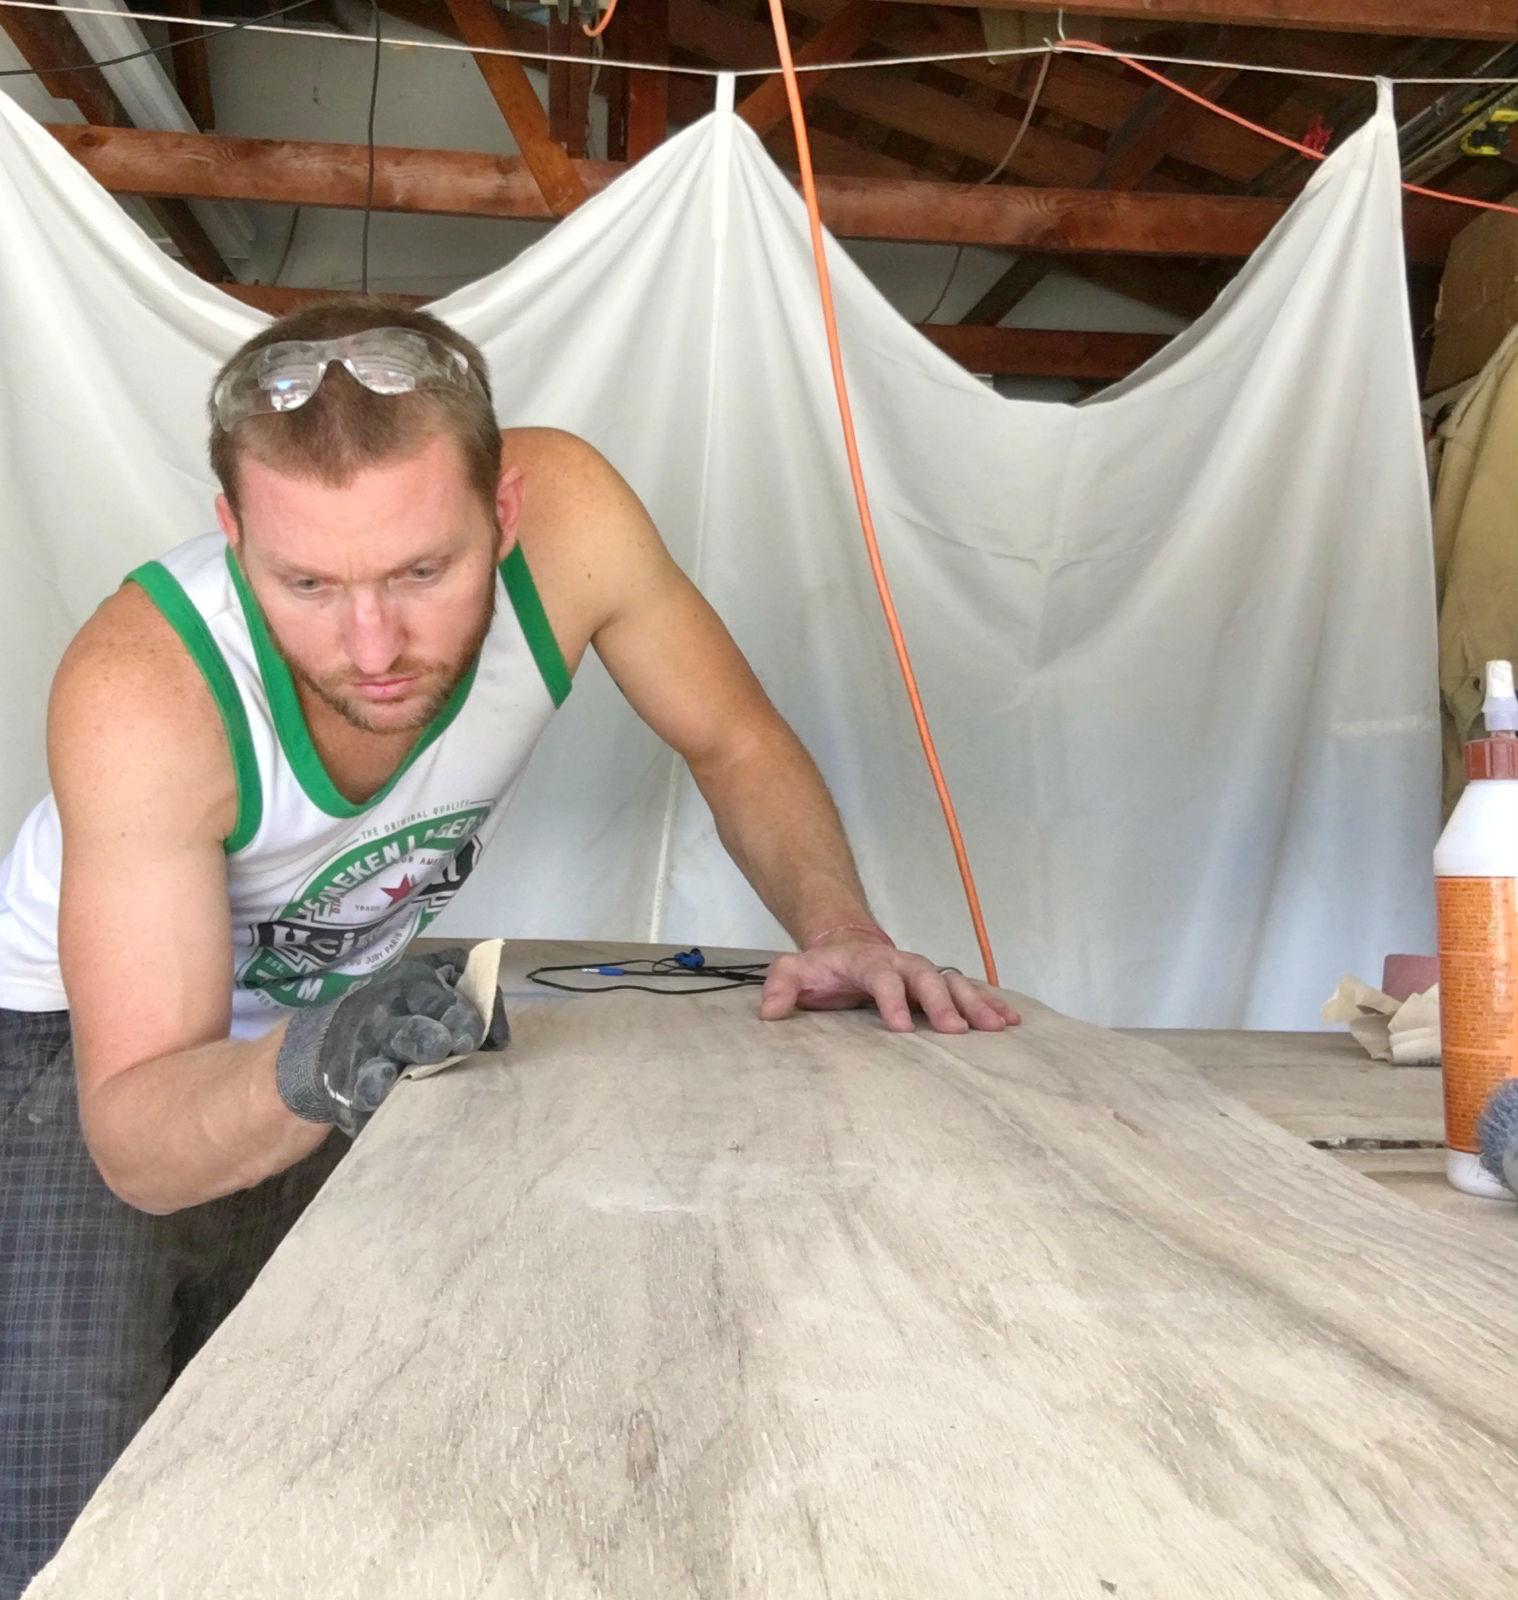 Kurtis Kruger sanding down the wood in his workshop.